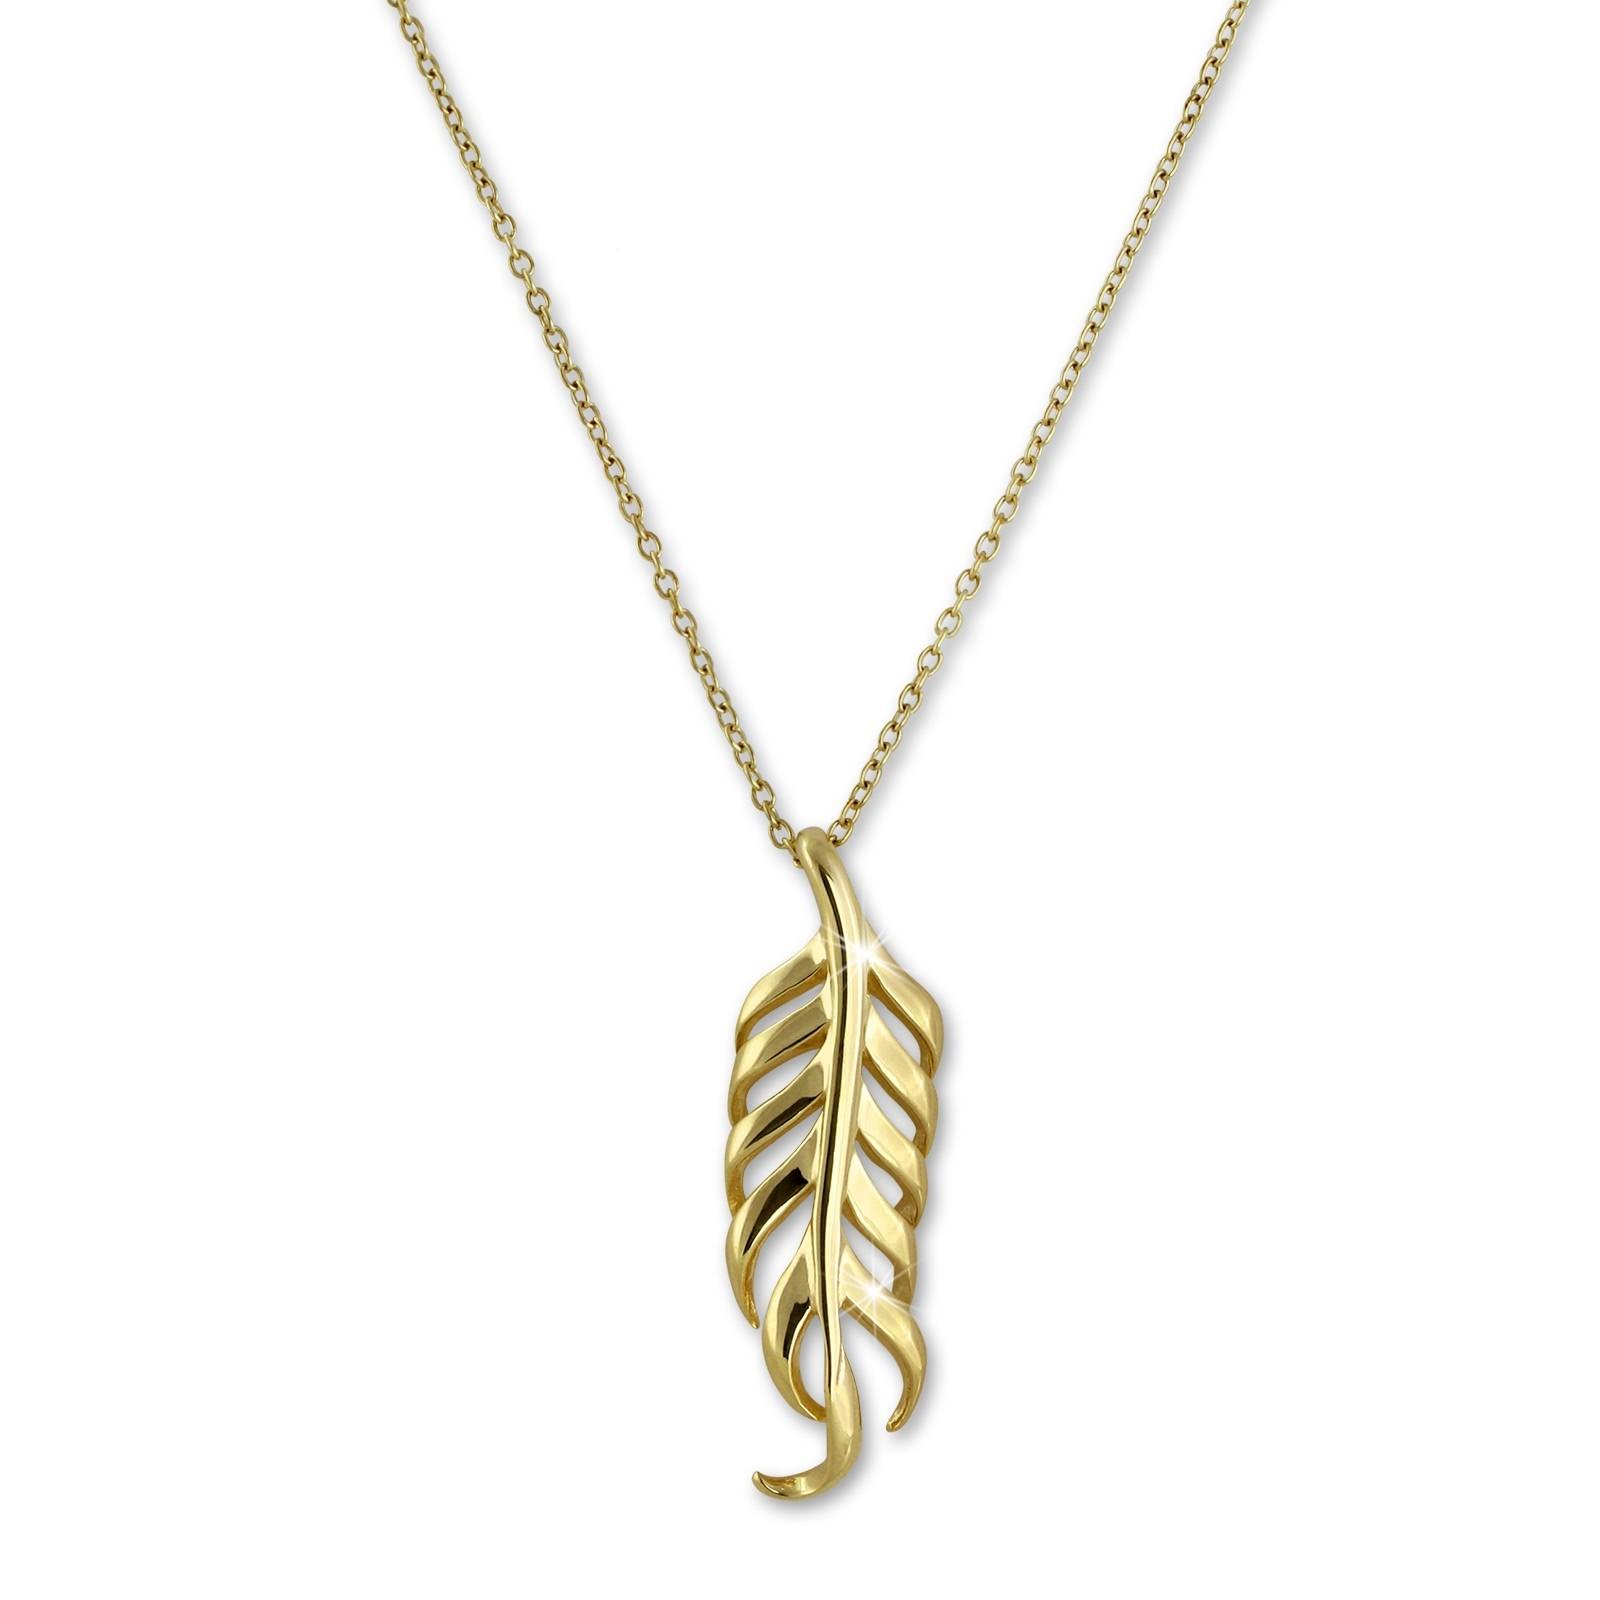 SilberDream Halskette Feder vergoldet 44cm - 47cm 925er Silber SDK50544Y